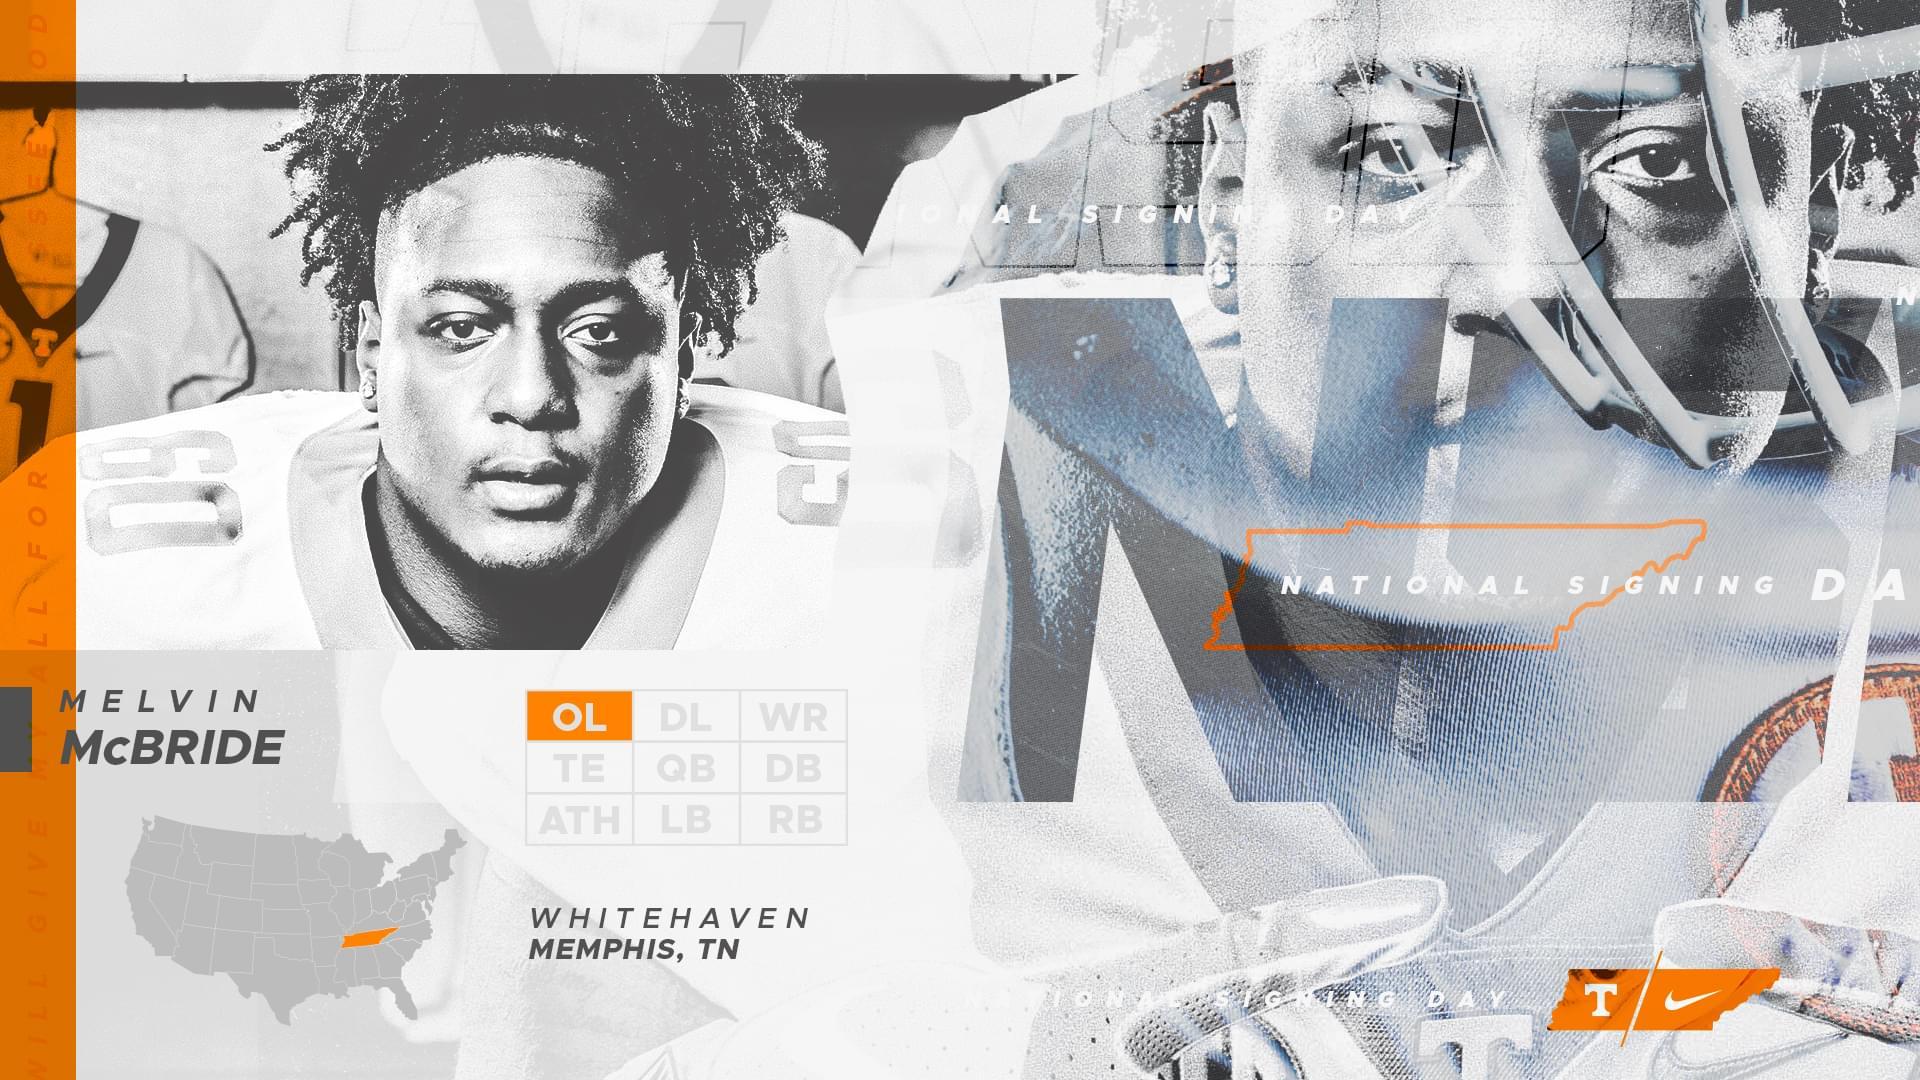 Vols 2019 class signee 9 – OL Melvin McBride